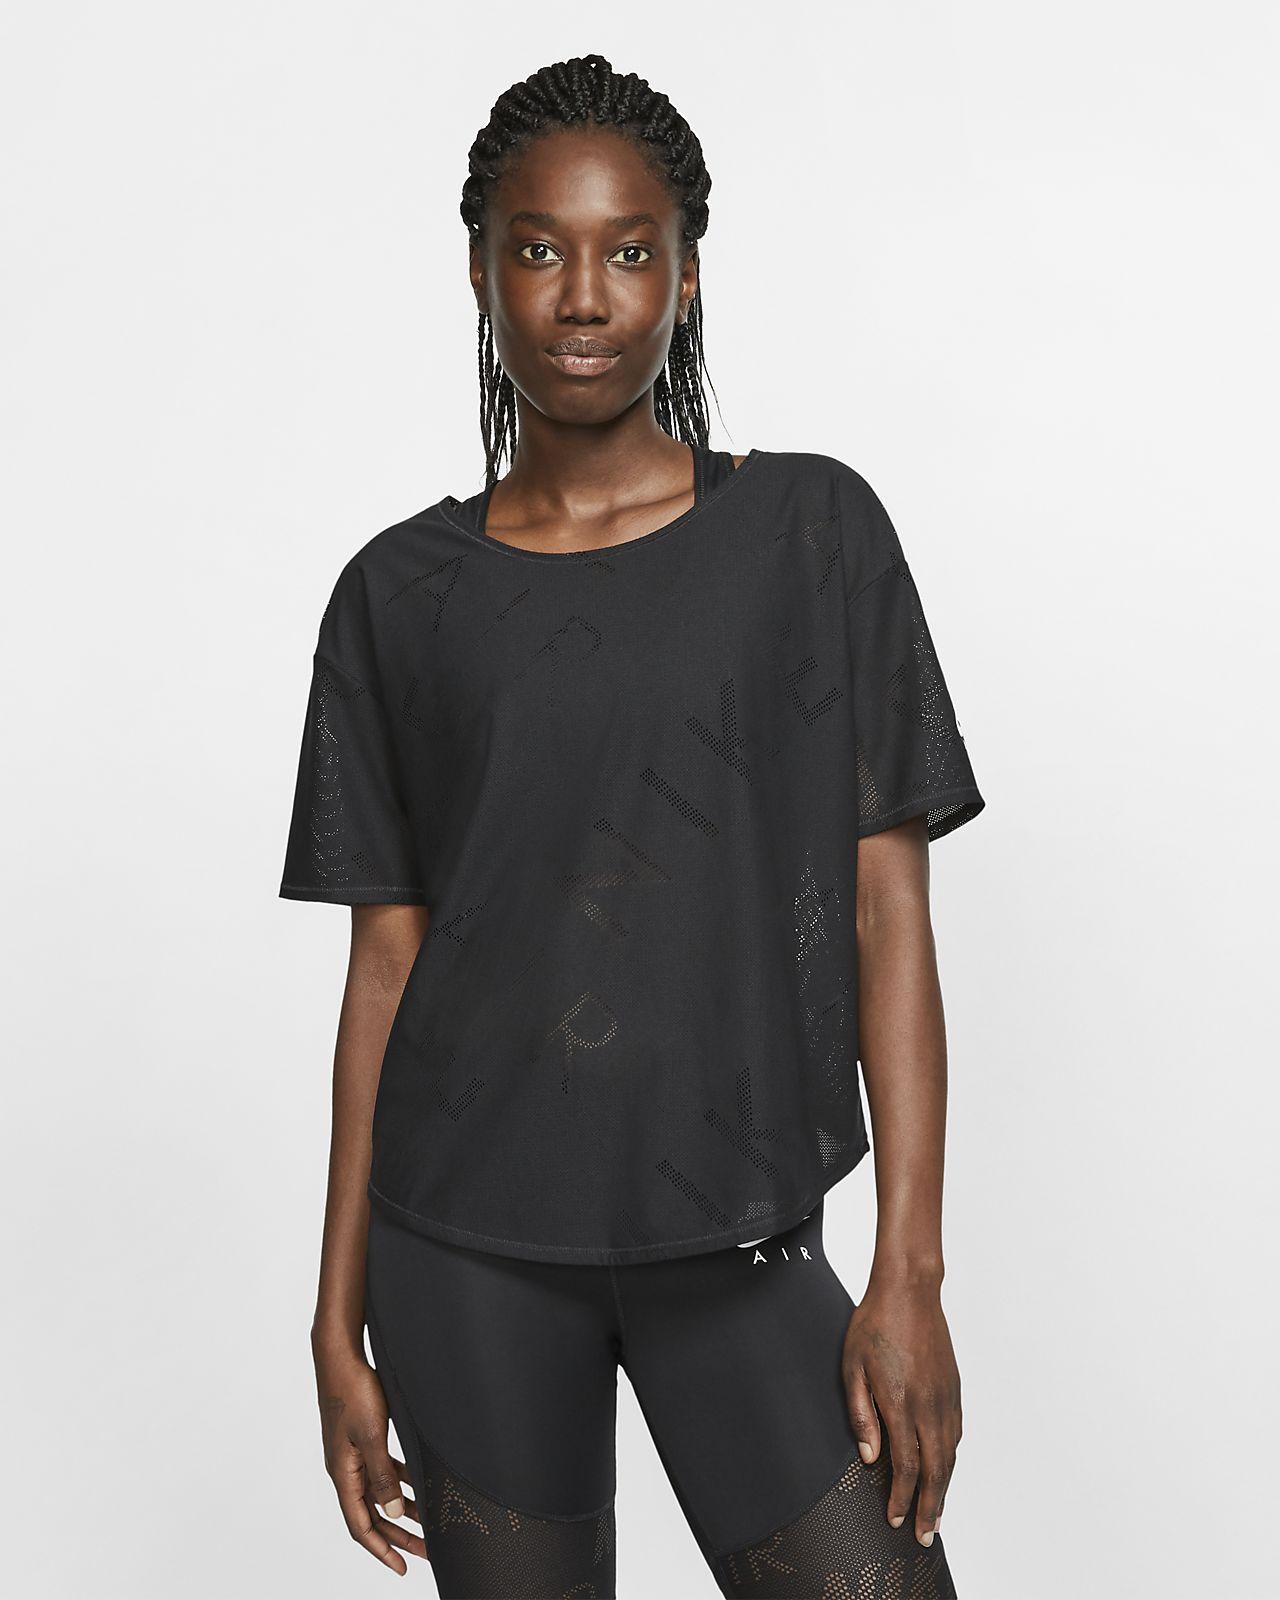 Женская беговая футболка с коротким рукавом Nike Air